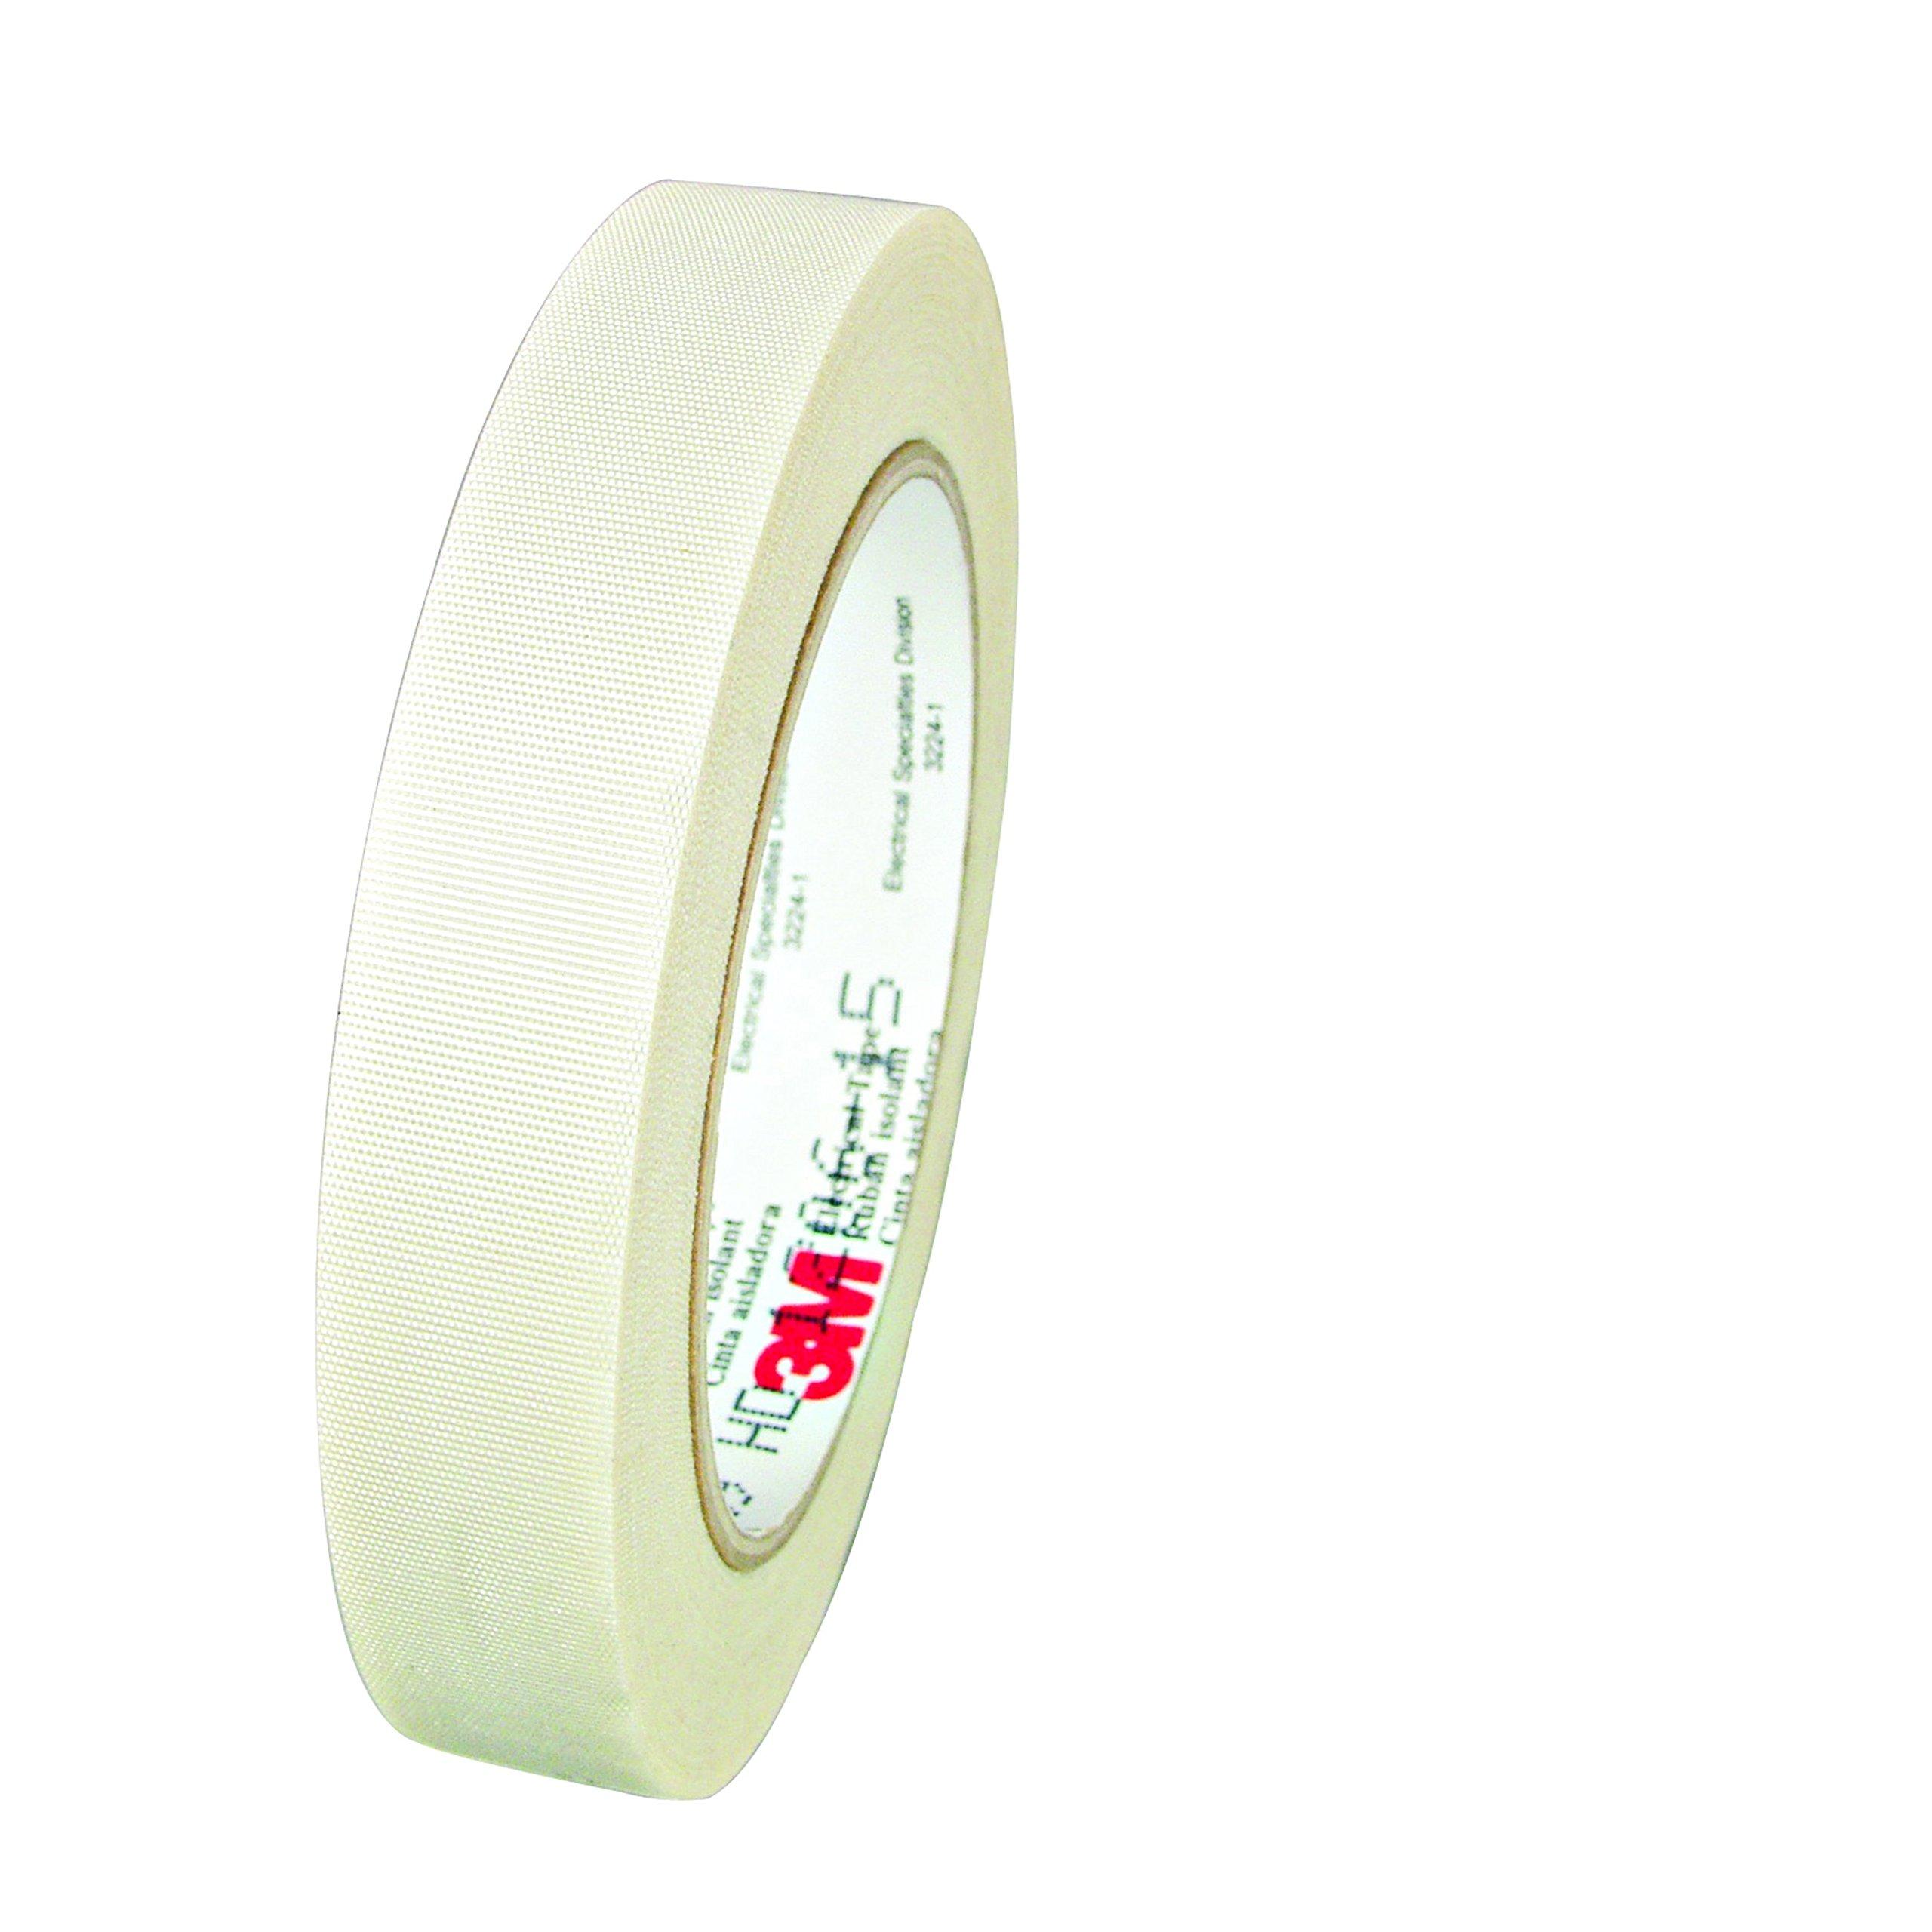 3M 69-3/4''X66' Glass Cloth Electrical Tape 69, 3/4'' x 66', White